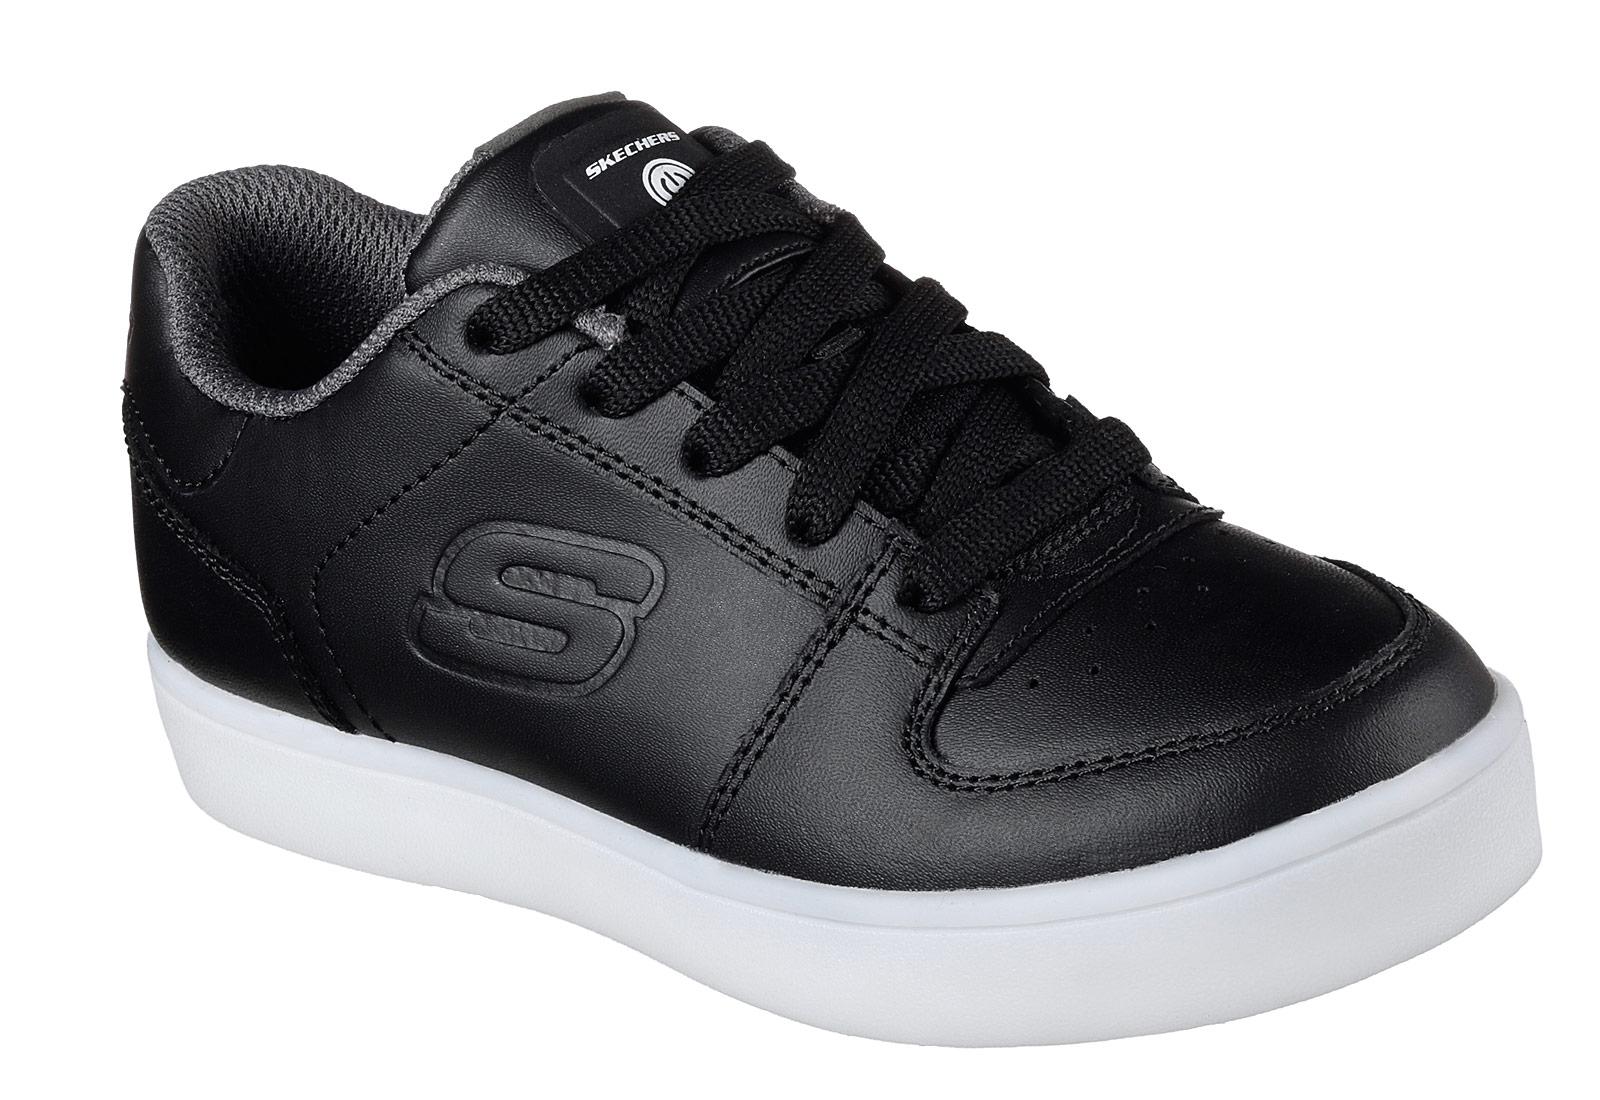 Skechers Shoes - Energy Lights - Elate